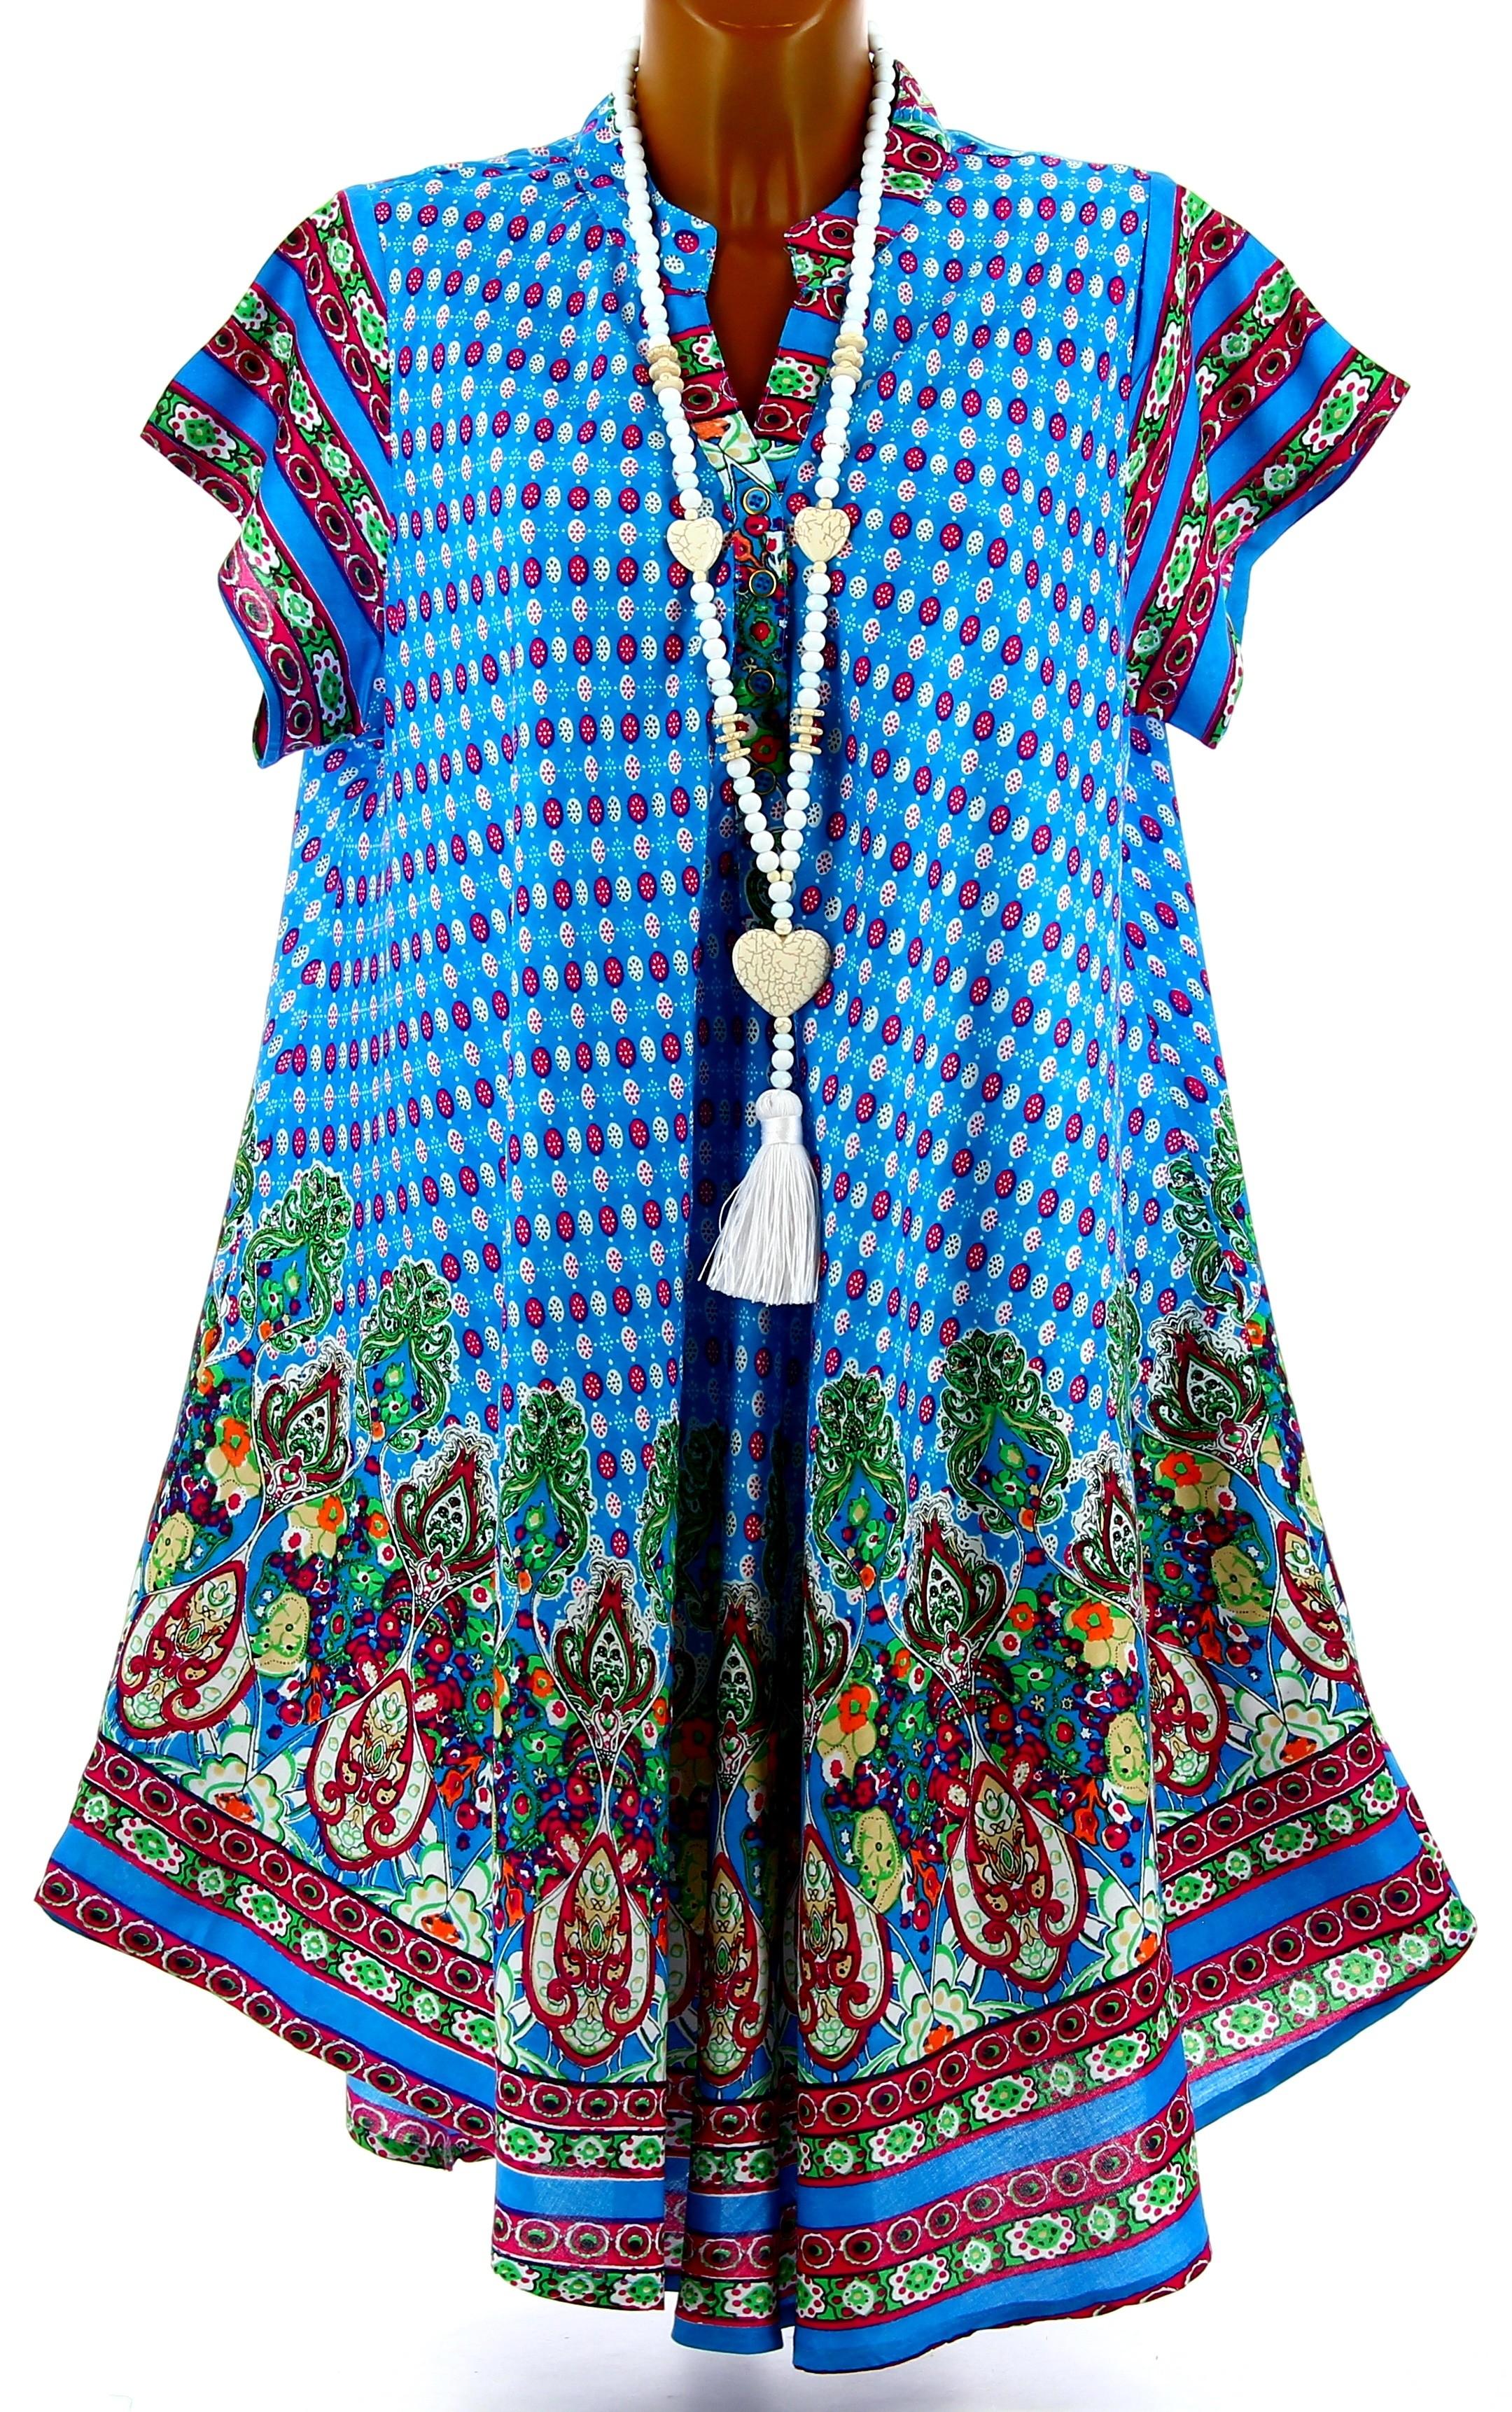 robe t asym trique boh me grande taille bleu turquoise leyla. Black Bedroom Furniture Sets. Home Design Ideas